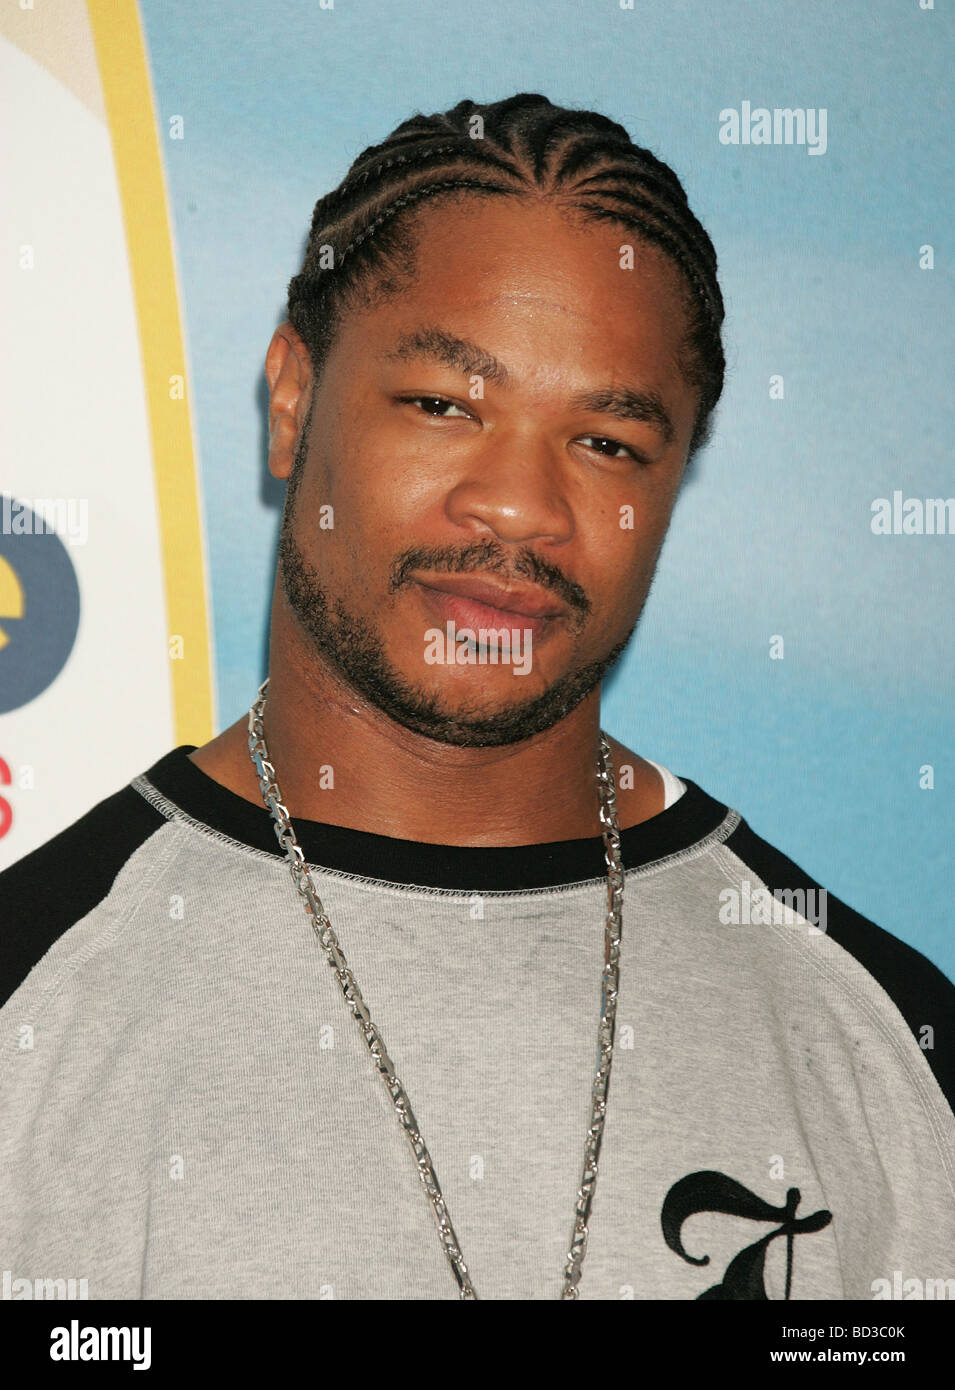 XZBIT - US rap singer in 2009 Stock Photo: 25276179 - Alamy